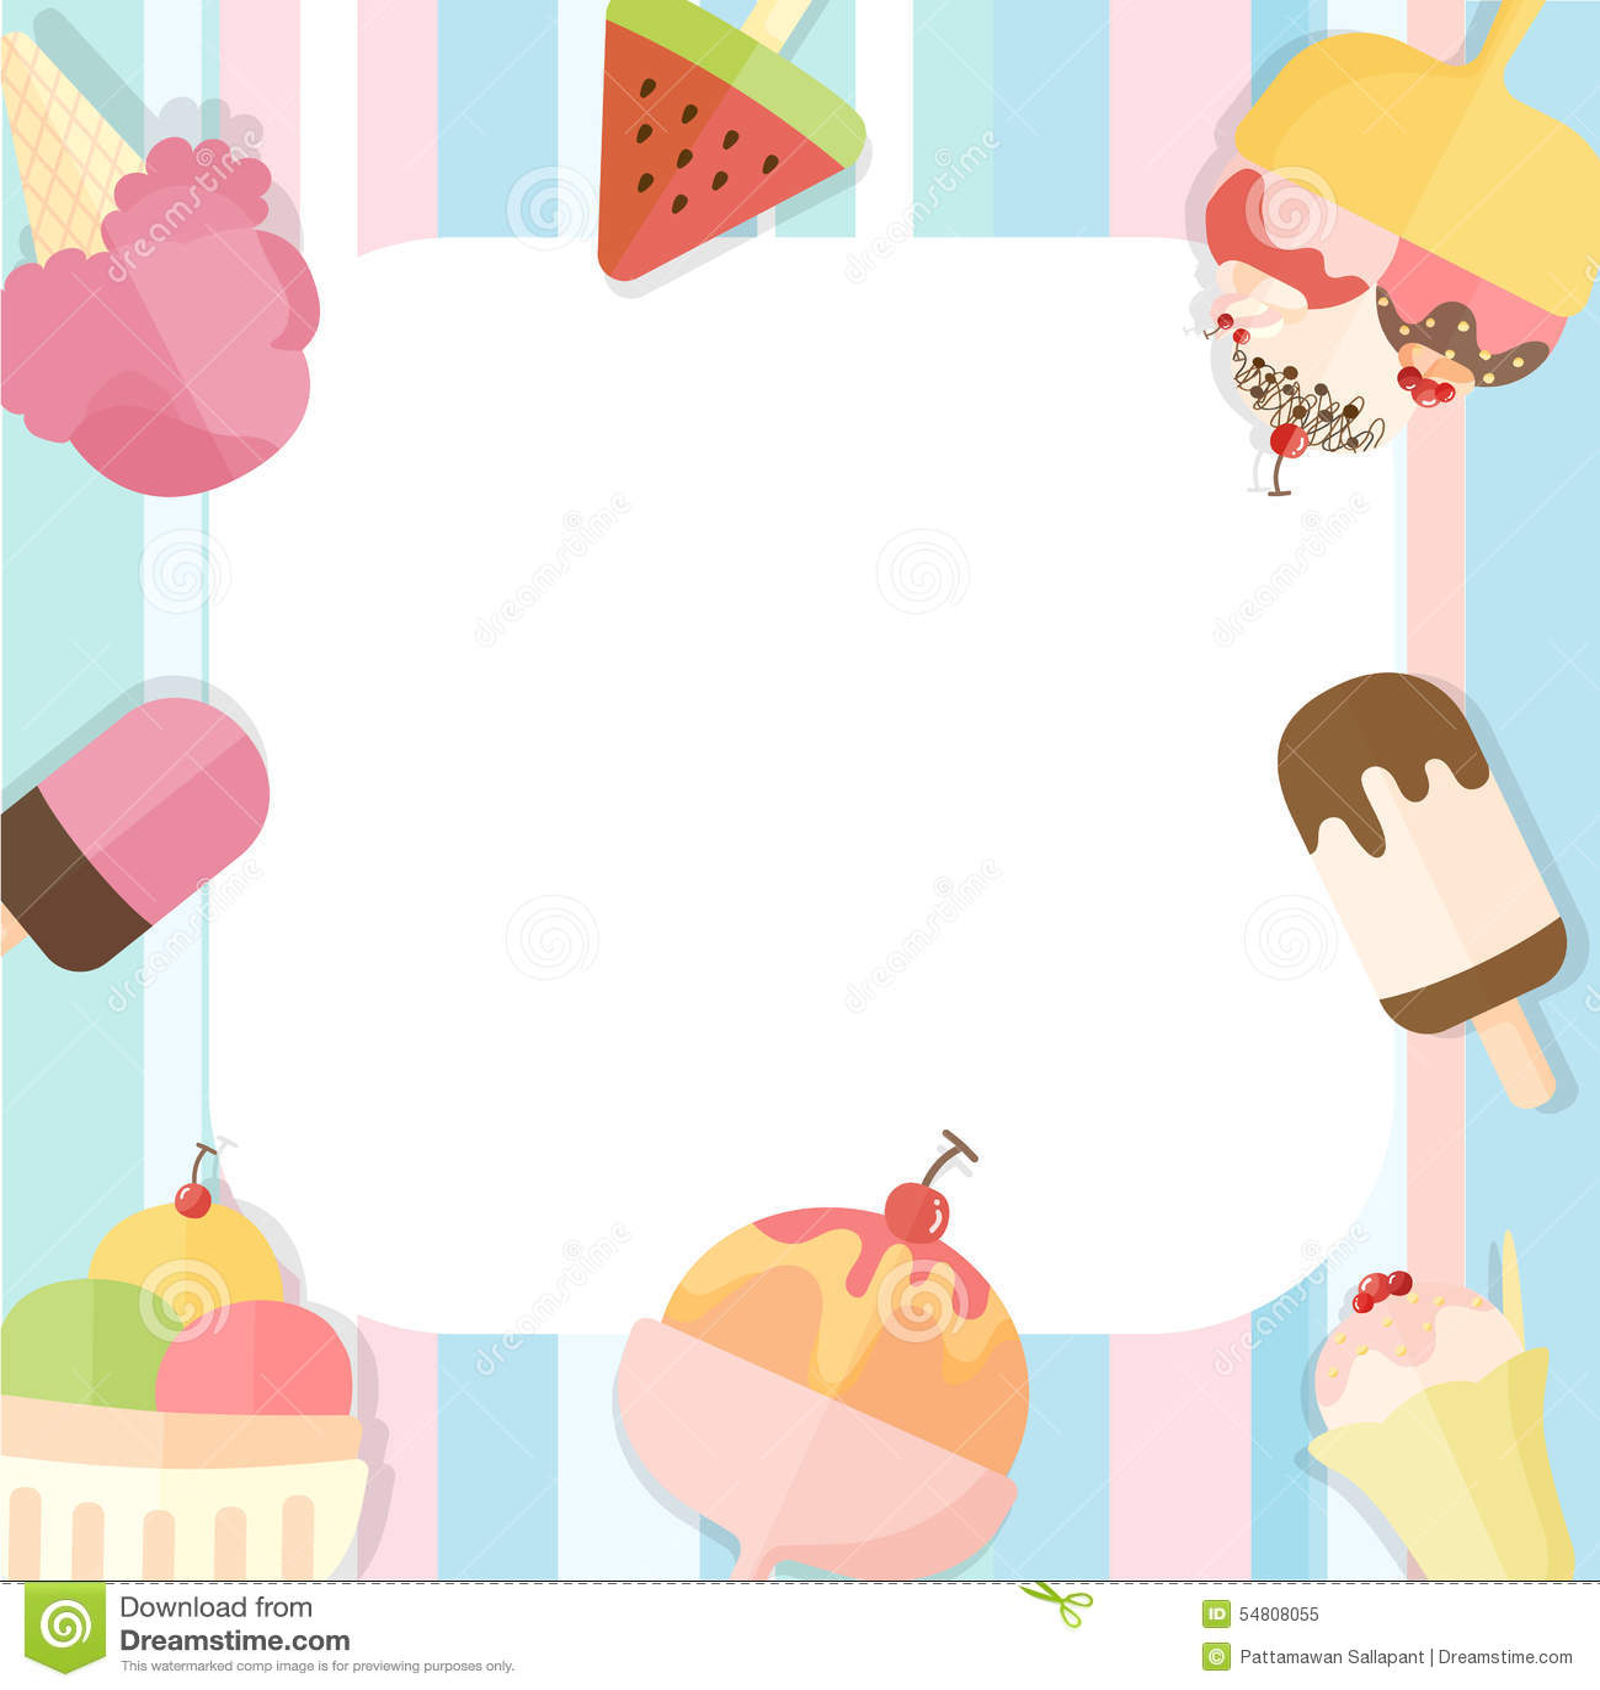 Summer Ice Cream Wallpaper: Summer Ice Cream Background Stock Vector